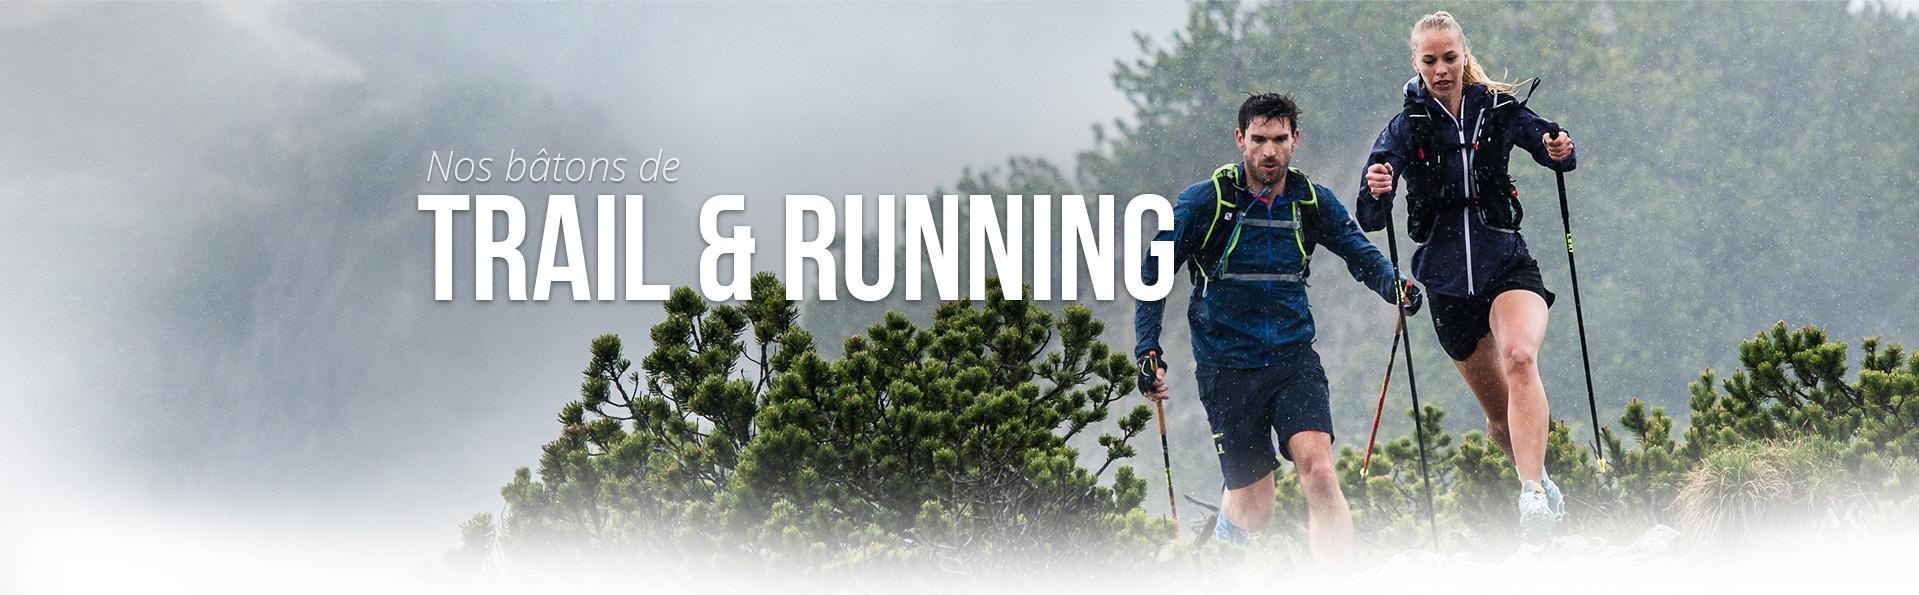 Bâton de Trail Running Guidetti